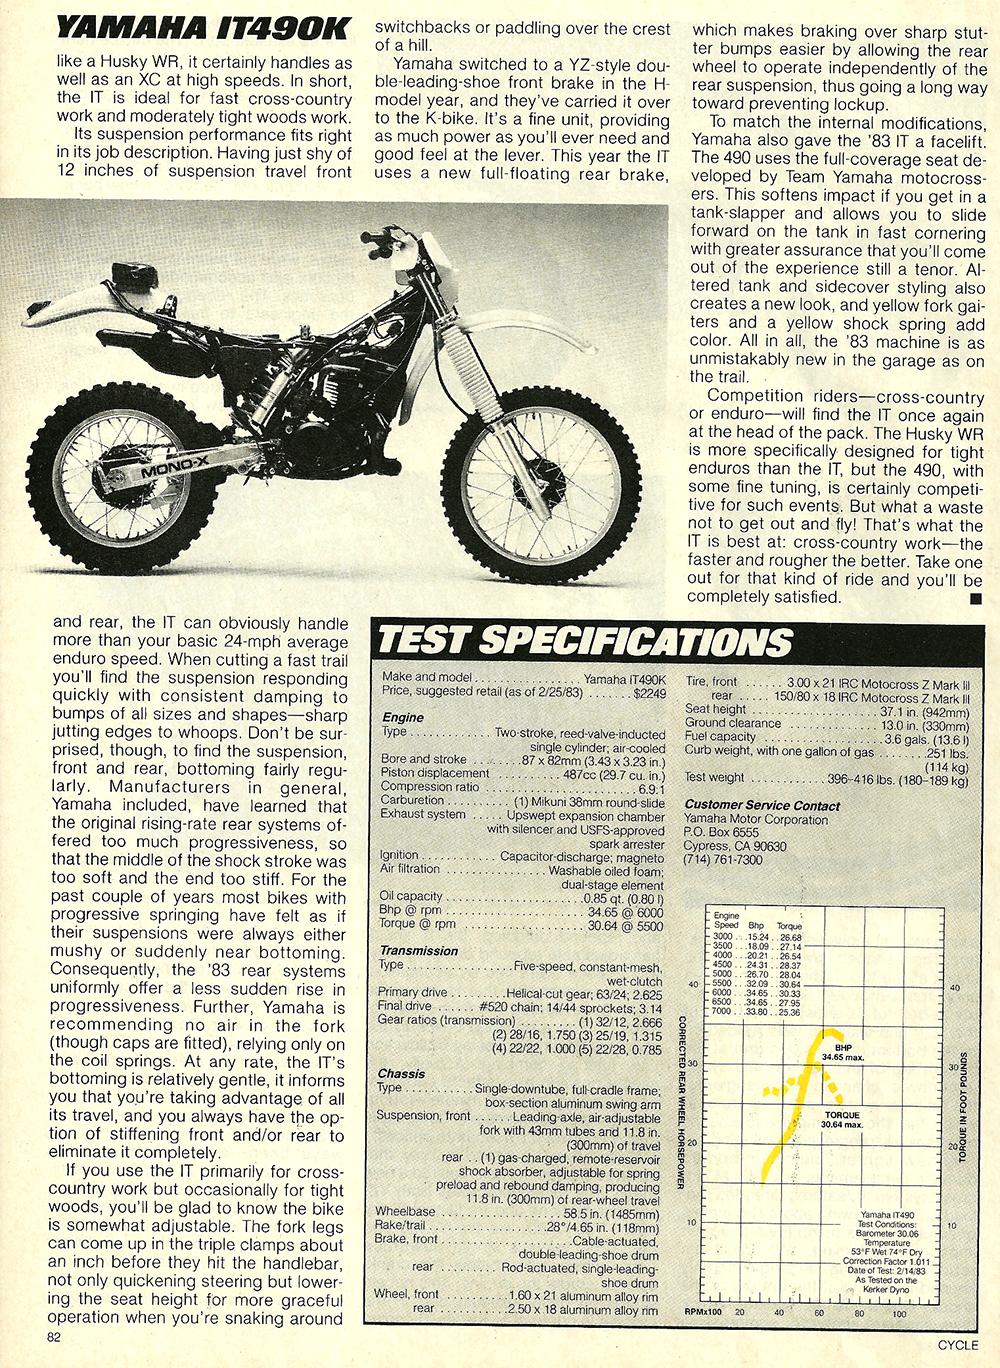 1983 Yamaha IT490K road test 6.jpg